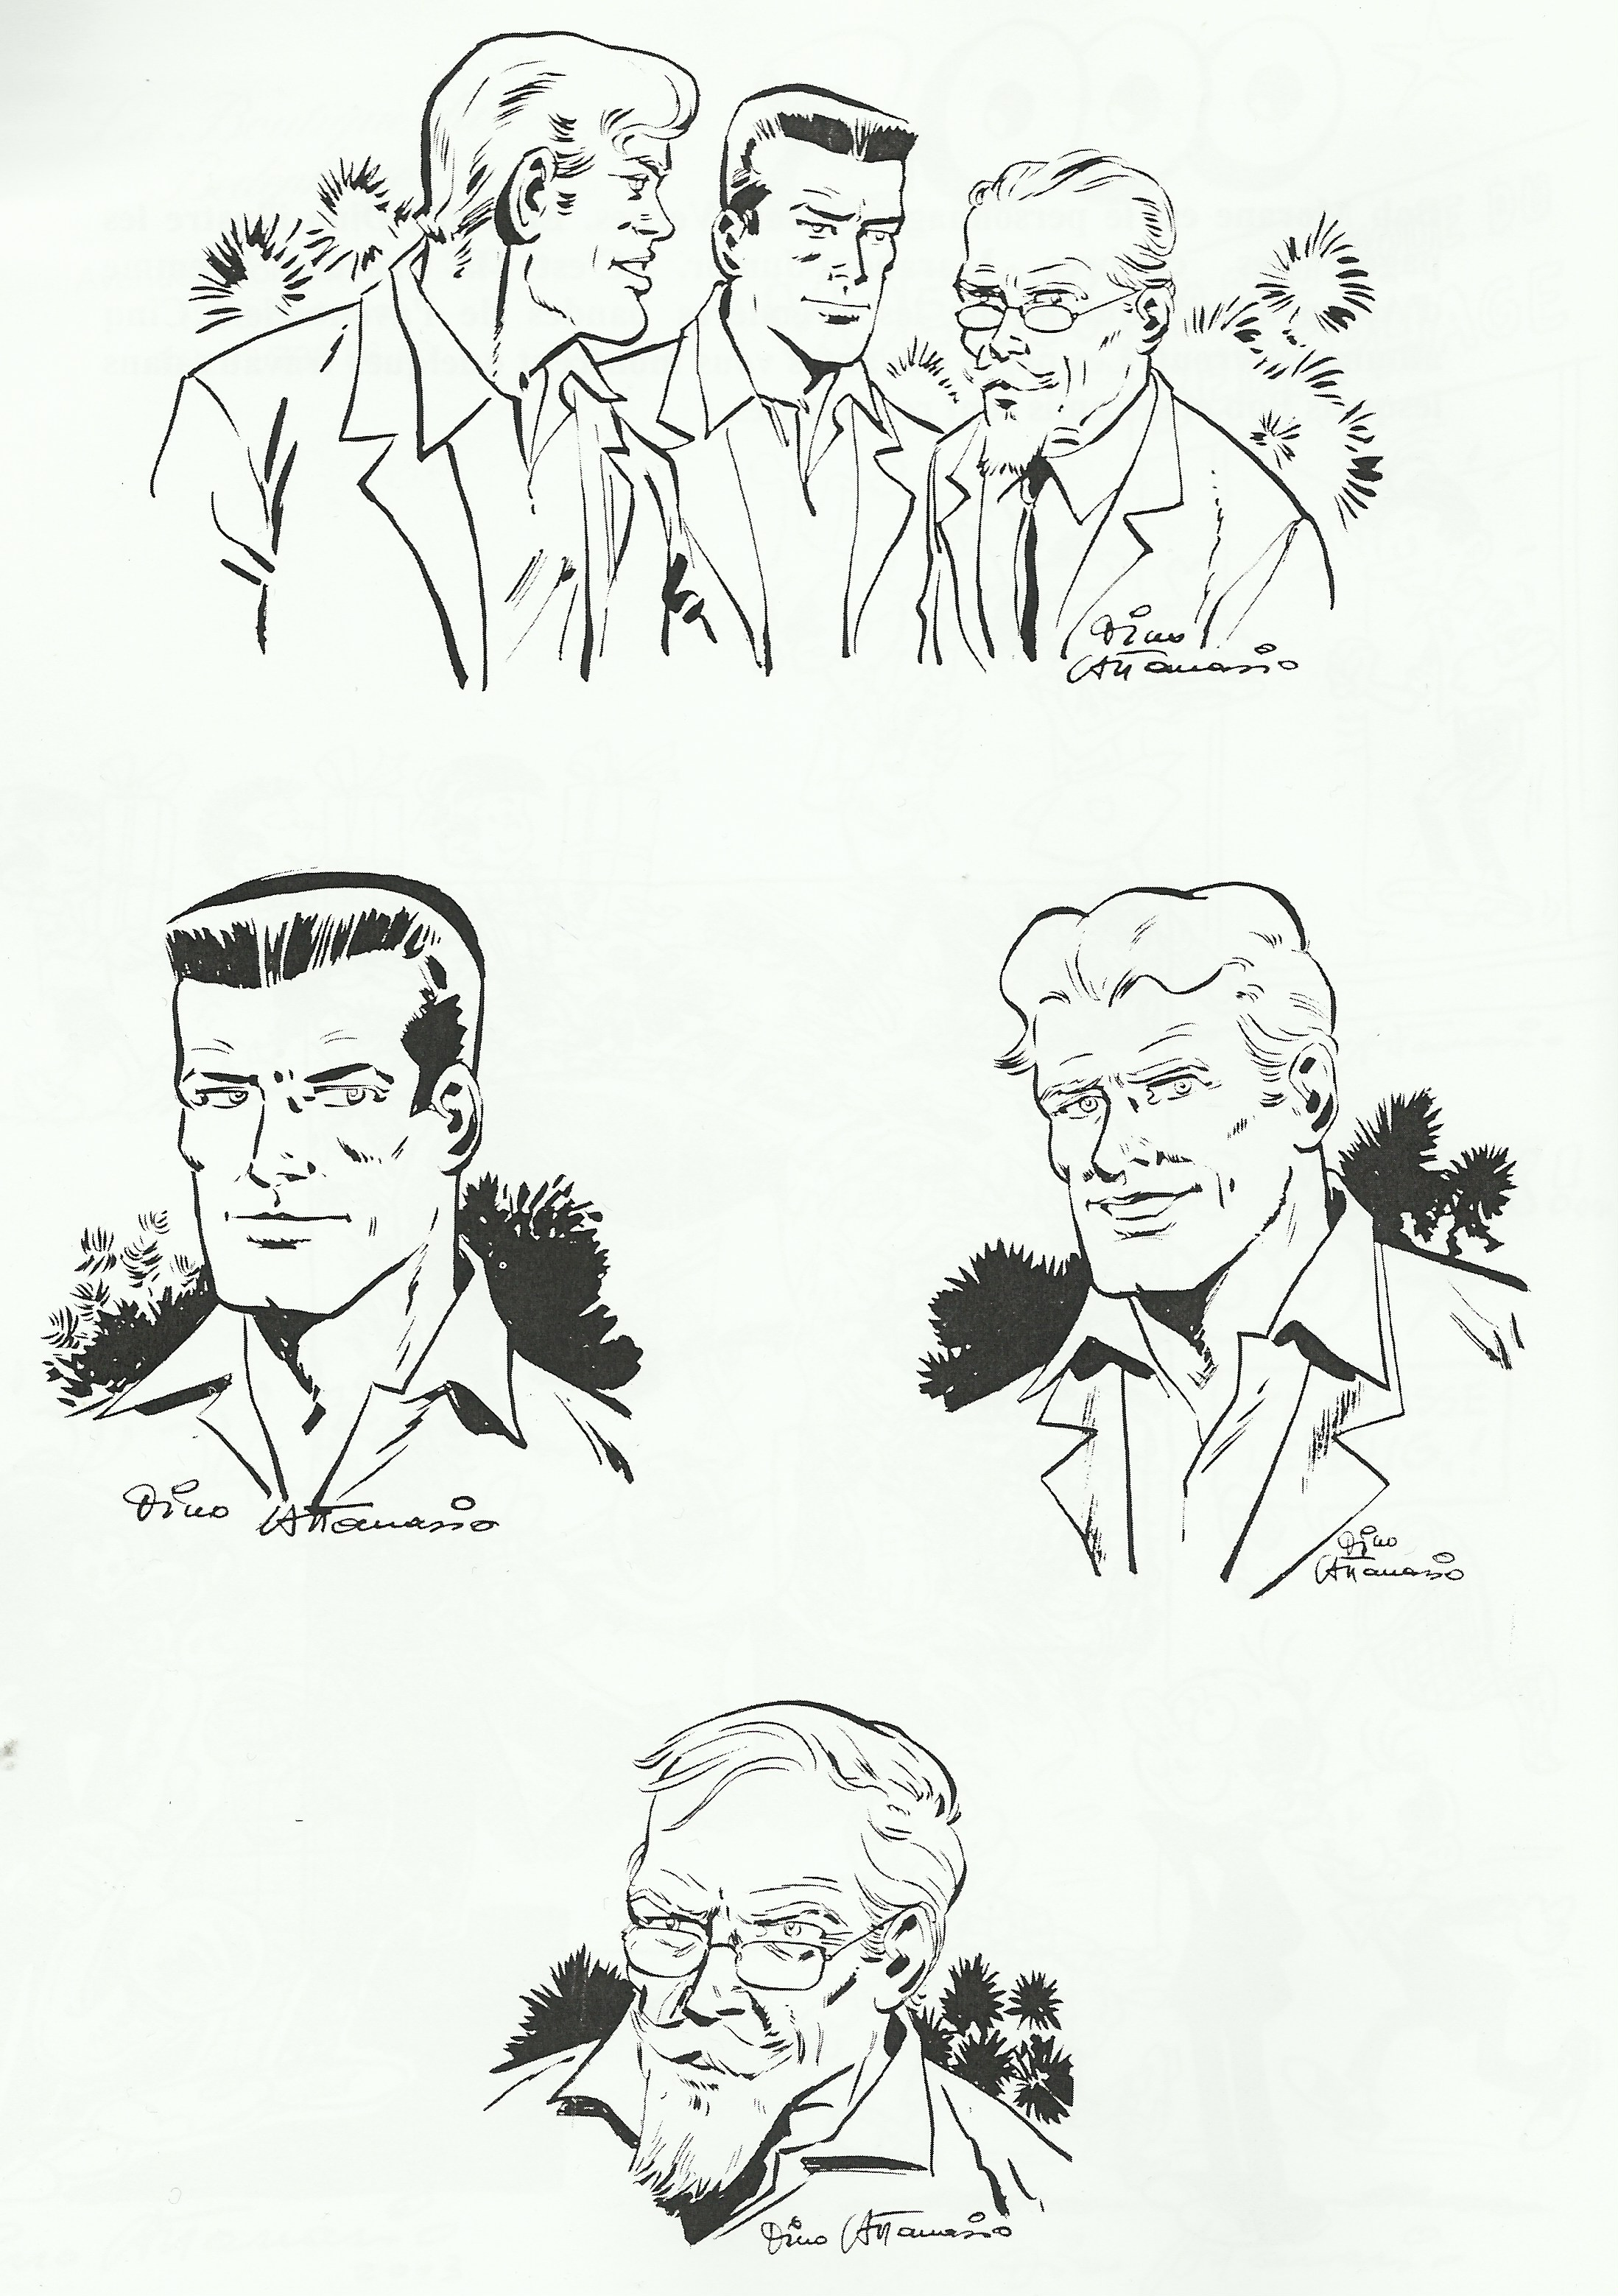 Quelques protagonistes de la série « Bob Morane » dessinés par Attanasio.